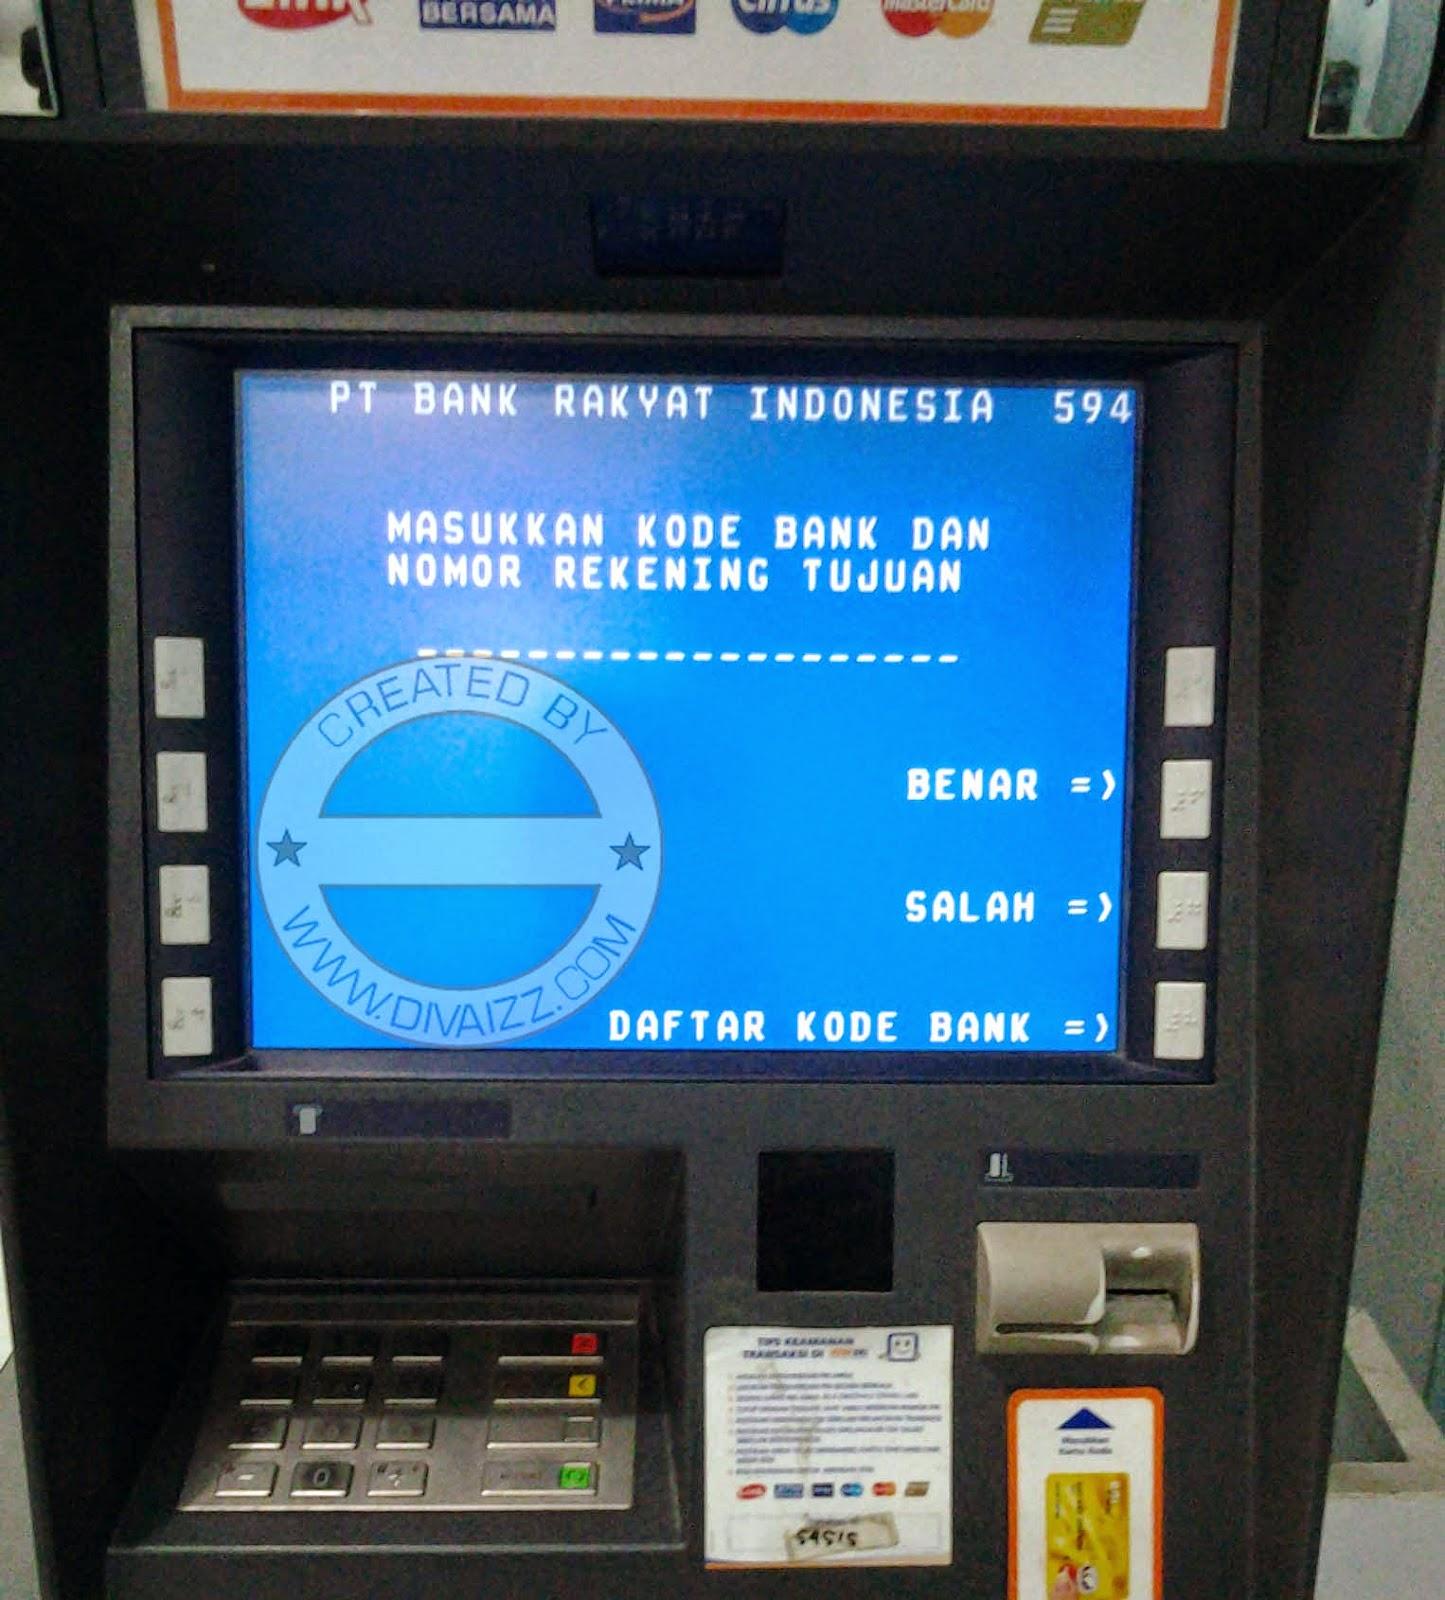 Kode Bank BRI,BNI,BCA,MANDIRI, Seluruh Indonesia - www.divaizz.com